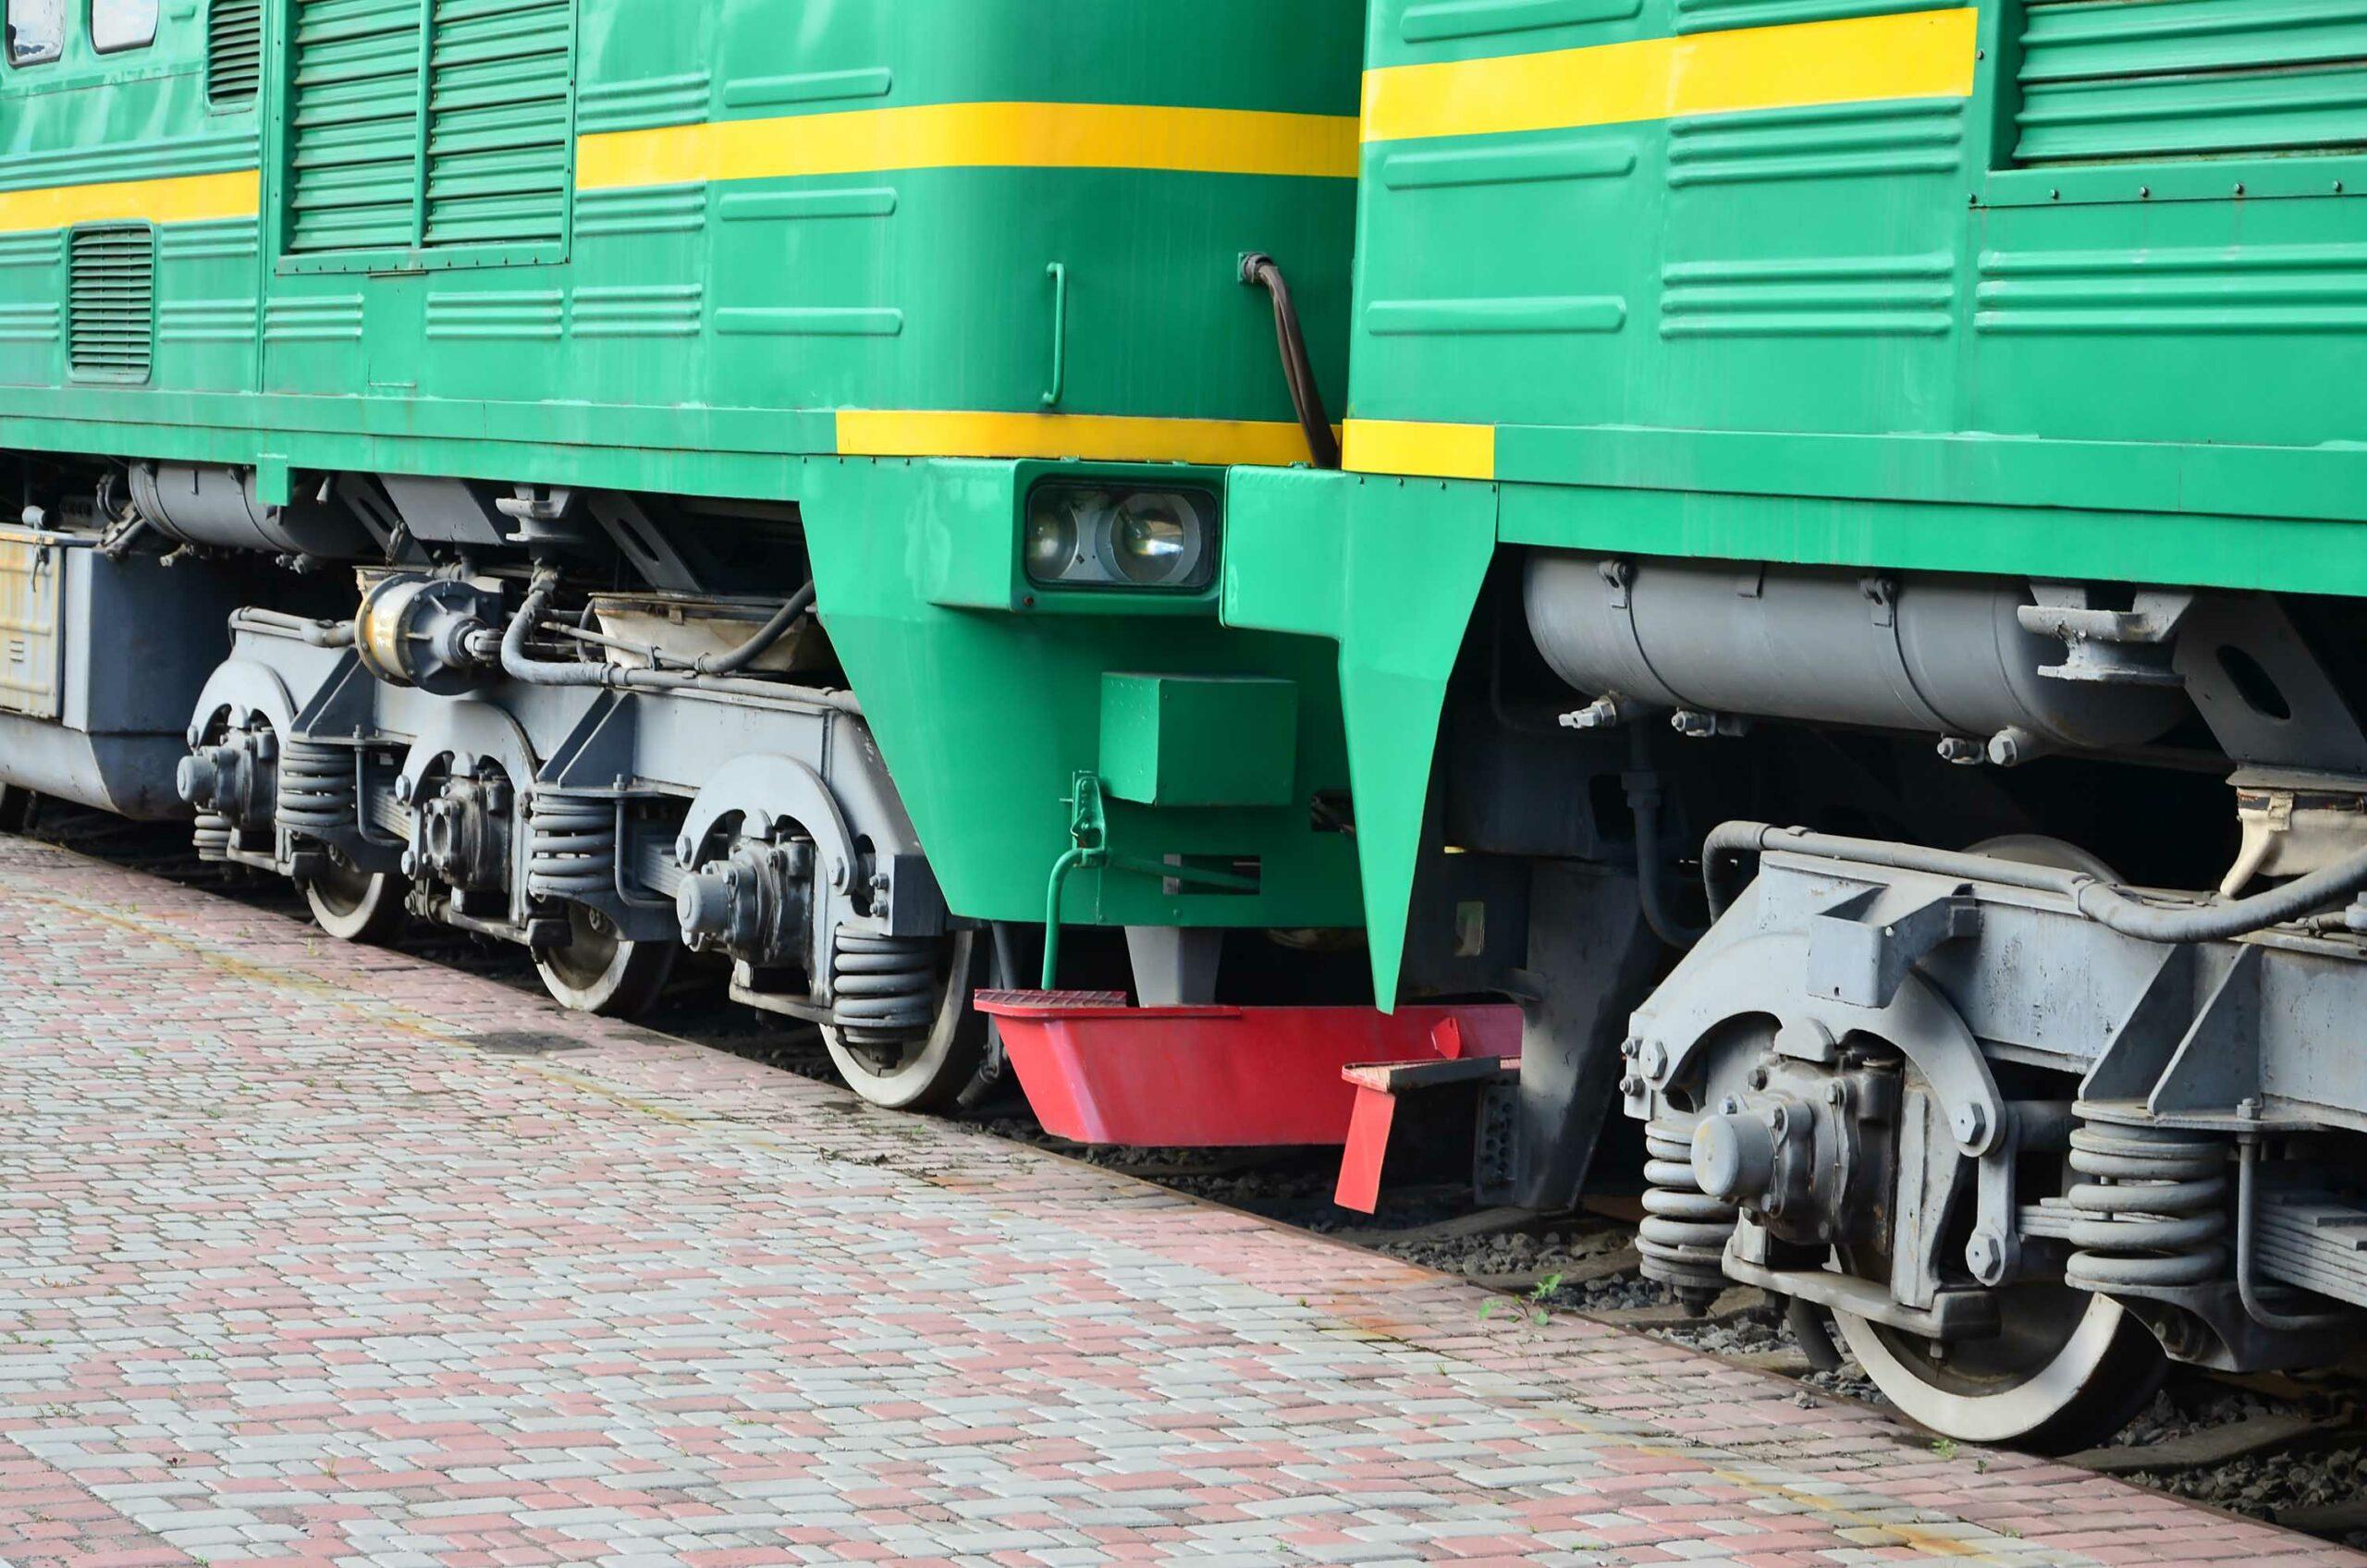 New multimodal rail service launced between Kaliningrad and Hamburg. 1